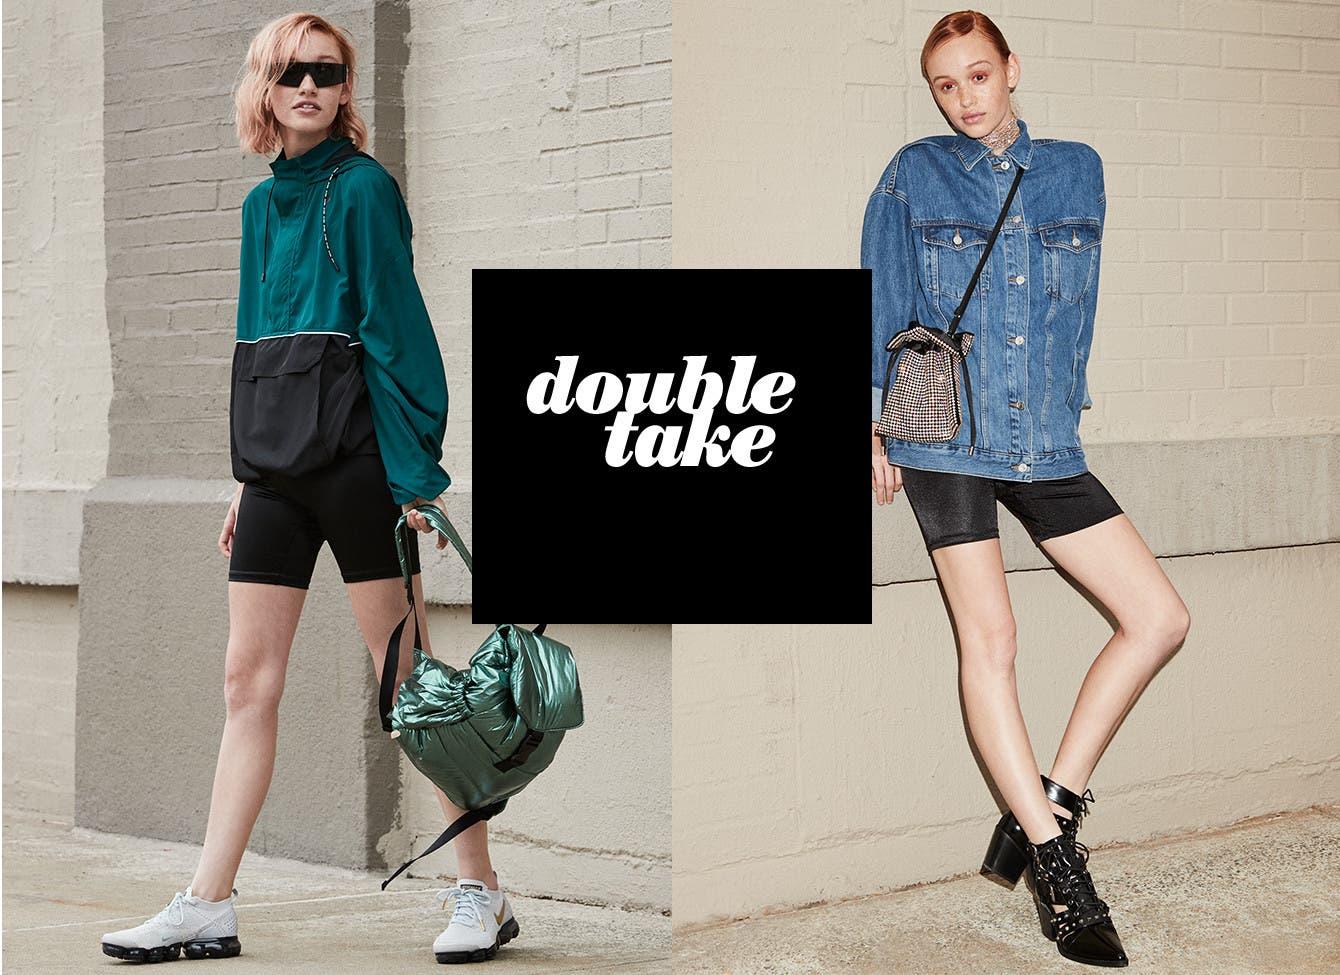 Double take.